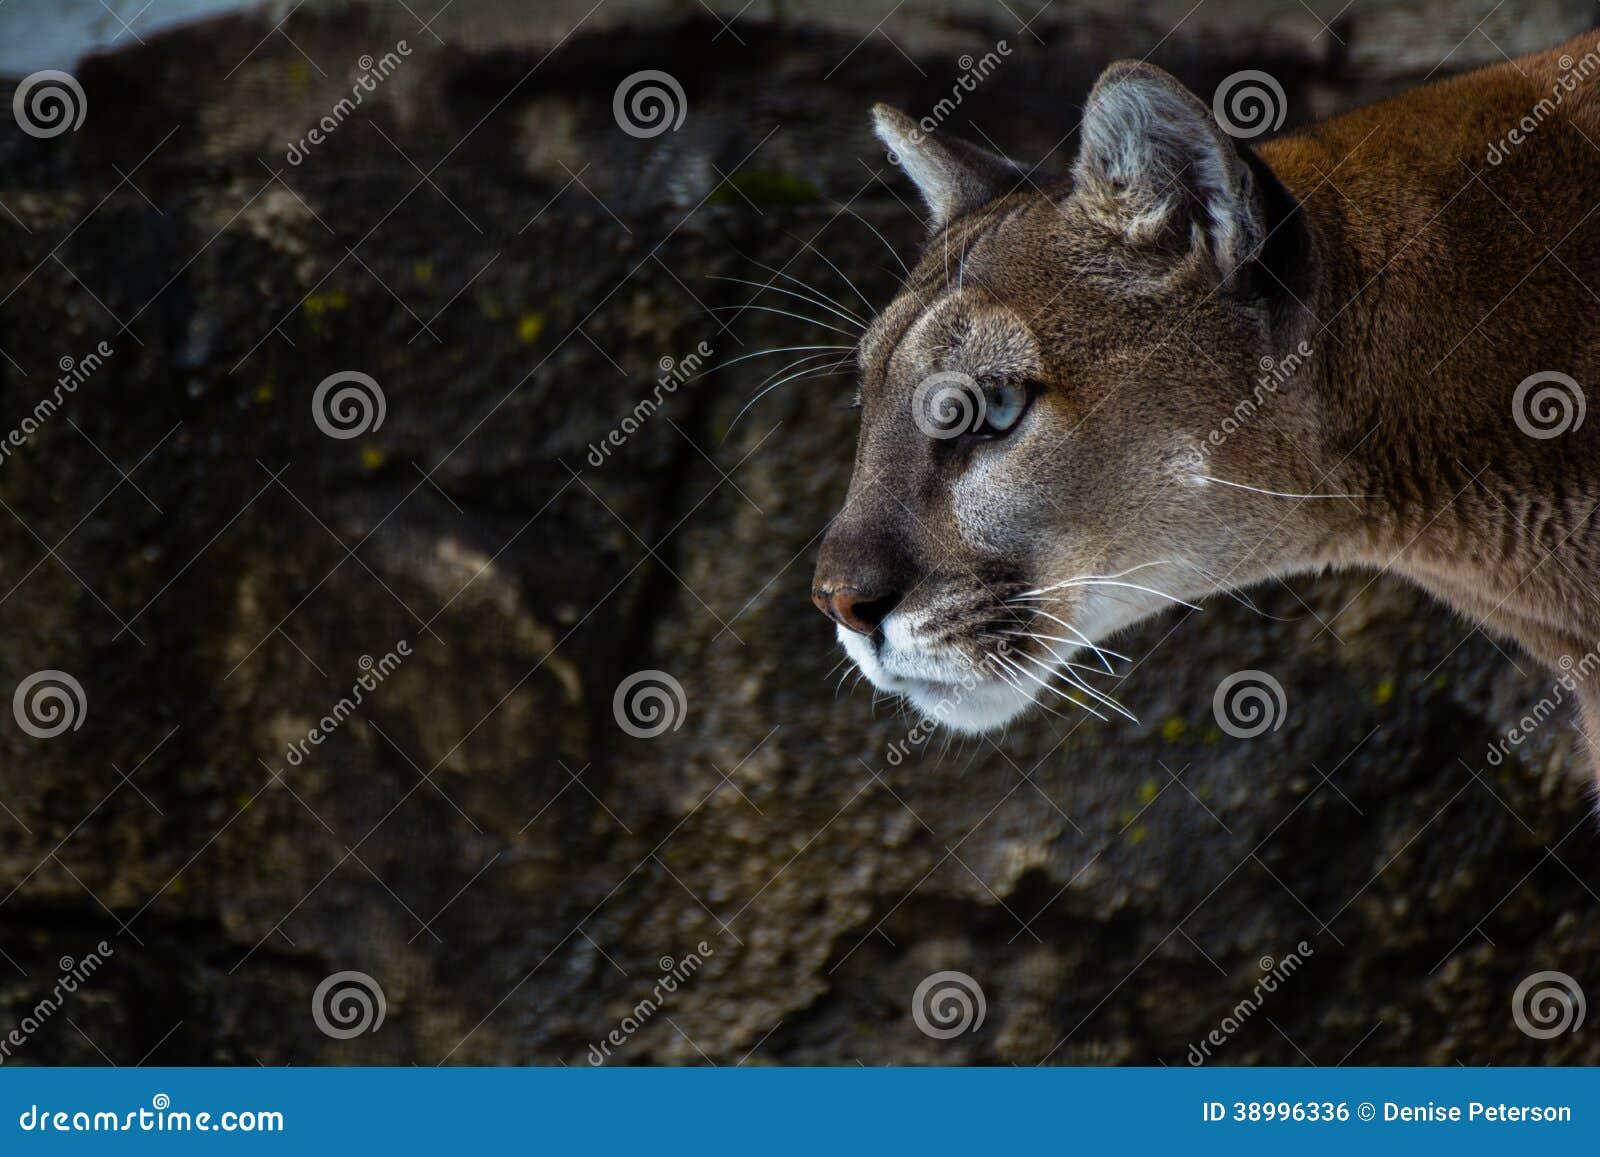 Mountain lion face close up - photo#19